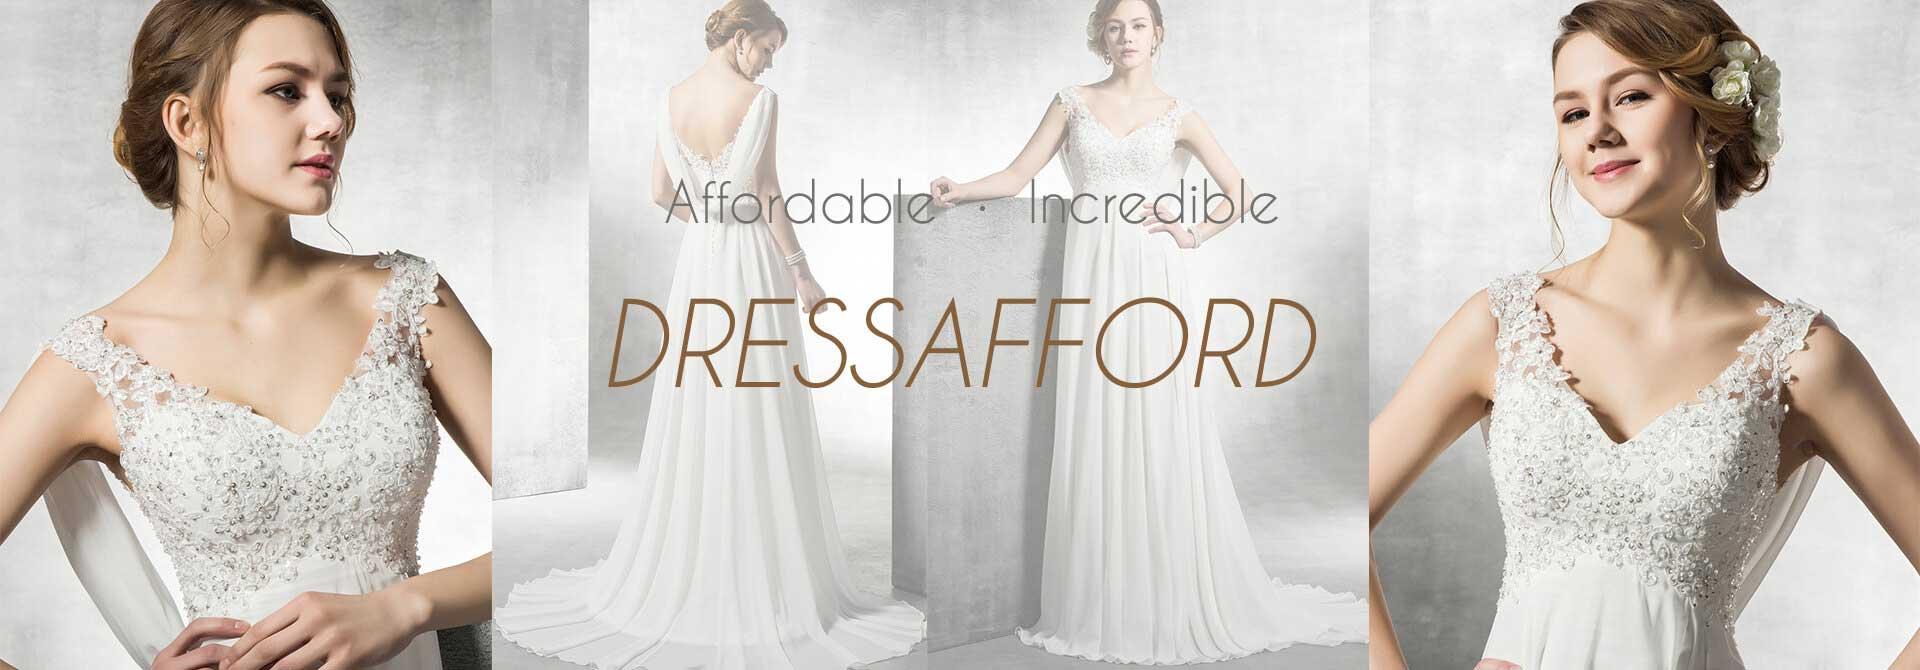 Dress Afford